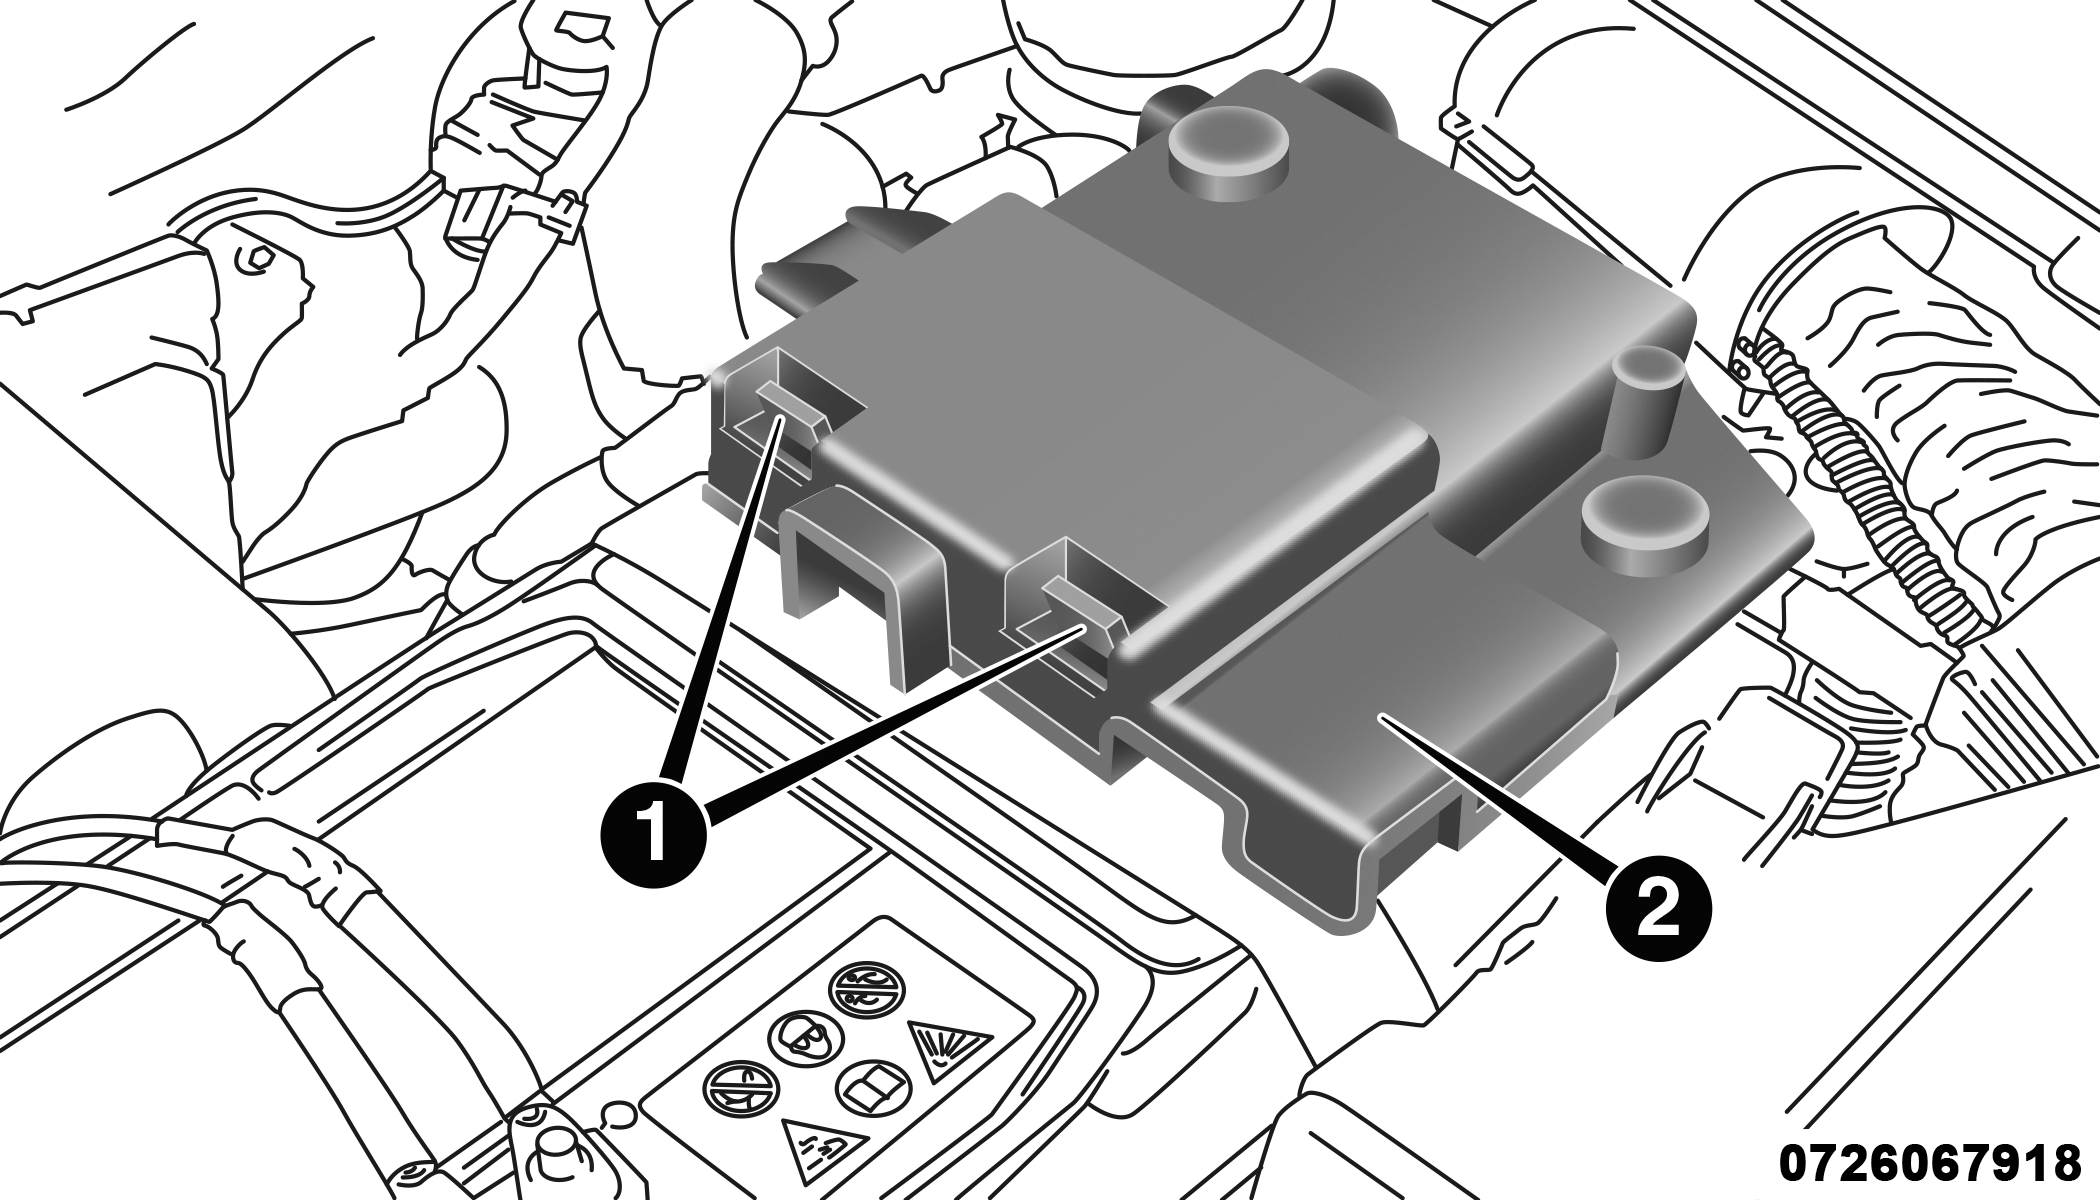 Official Mopar Site Service Parts Accessories More A Body Fuse Box Battery Cover Location